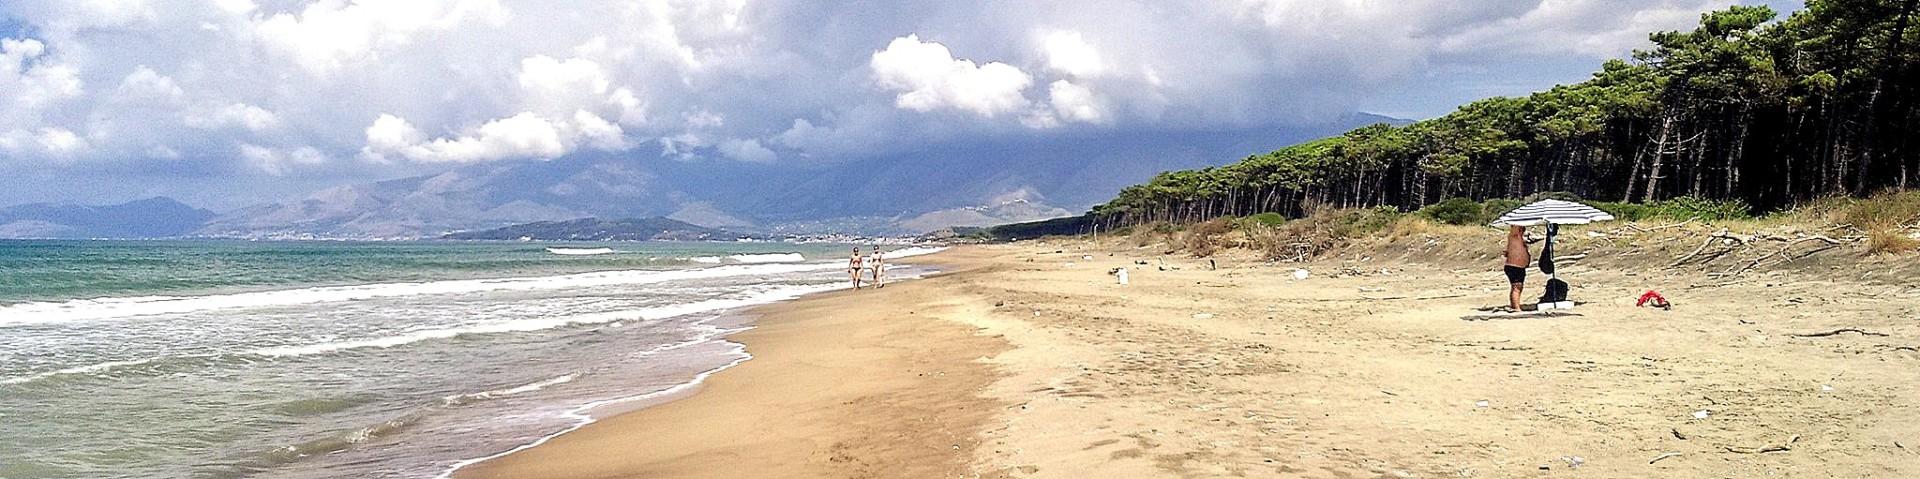 Baia Domizia, spoustu volných pláží na kraji letoviska